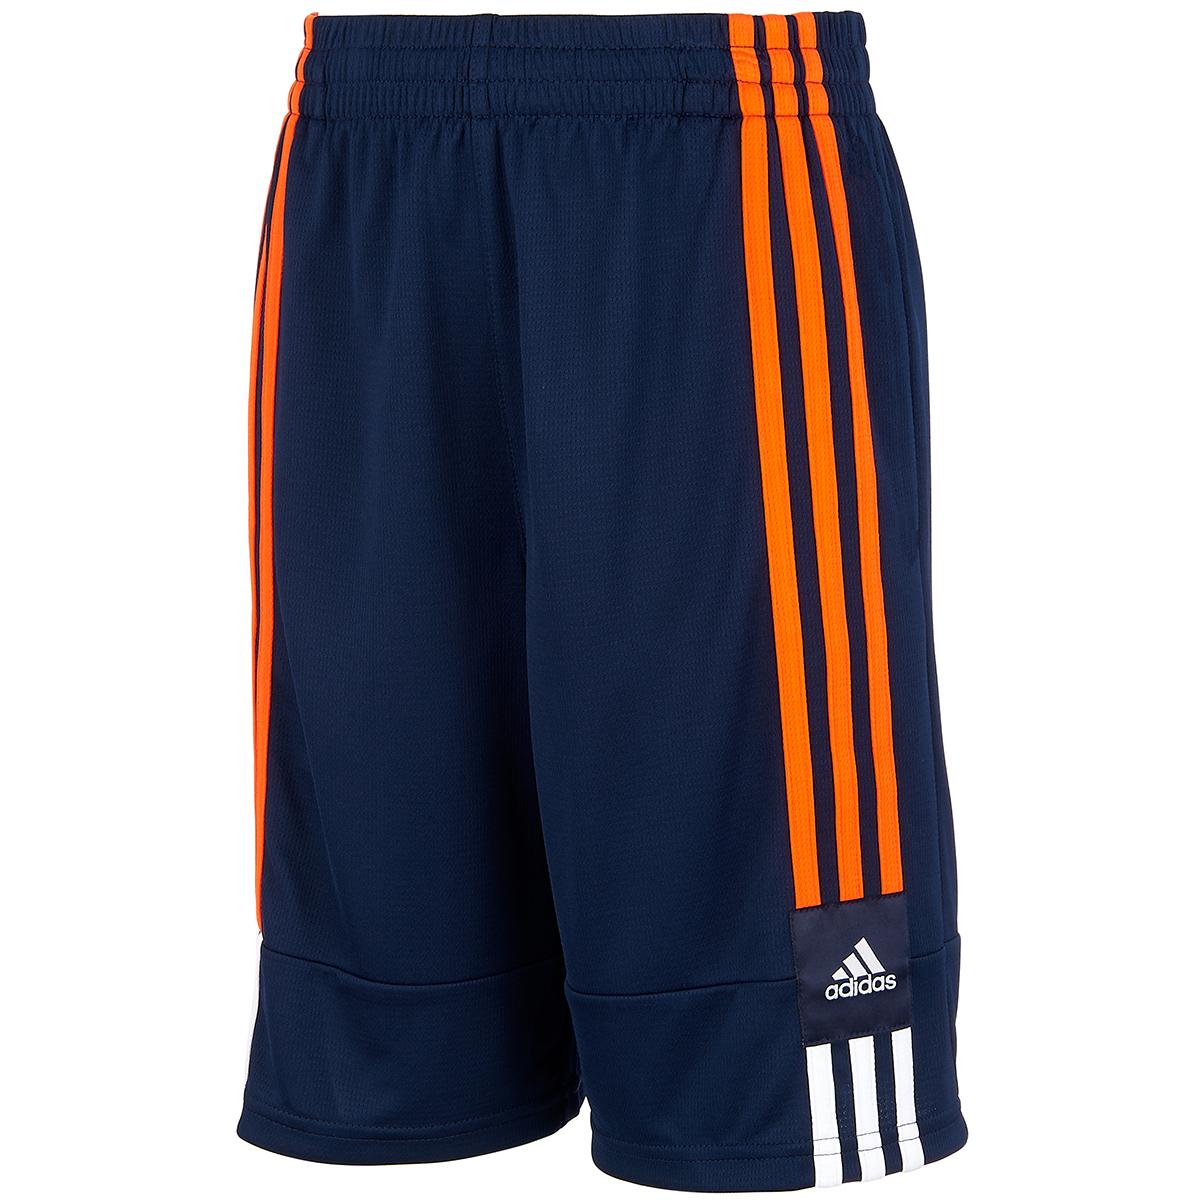 Adidas Boys' 3G Speed X Short - Blue, 7